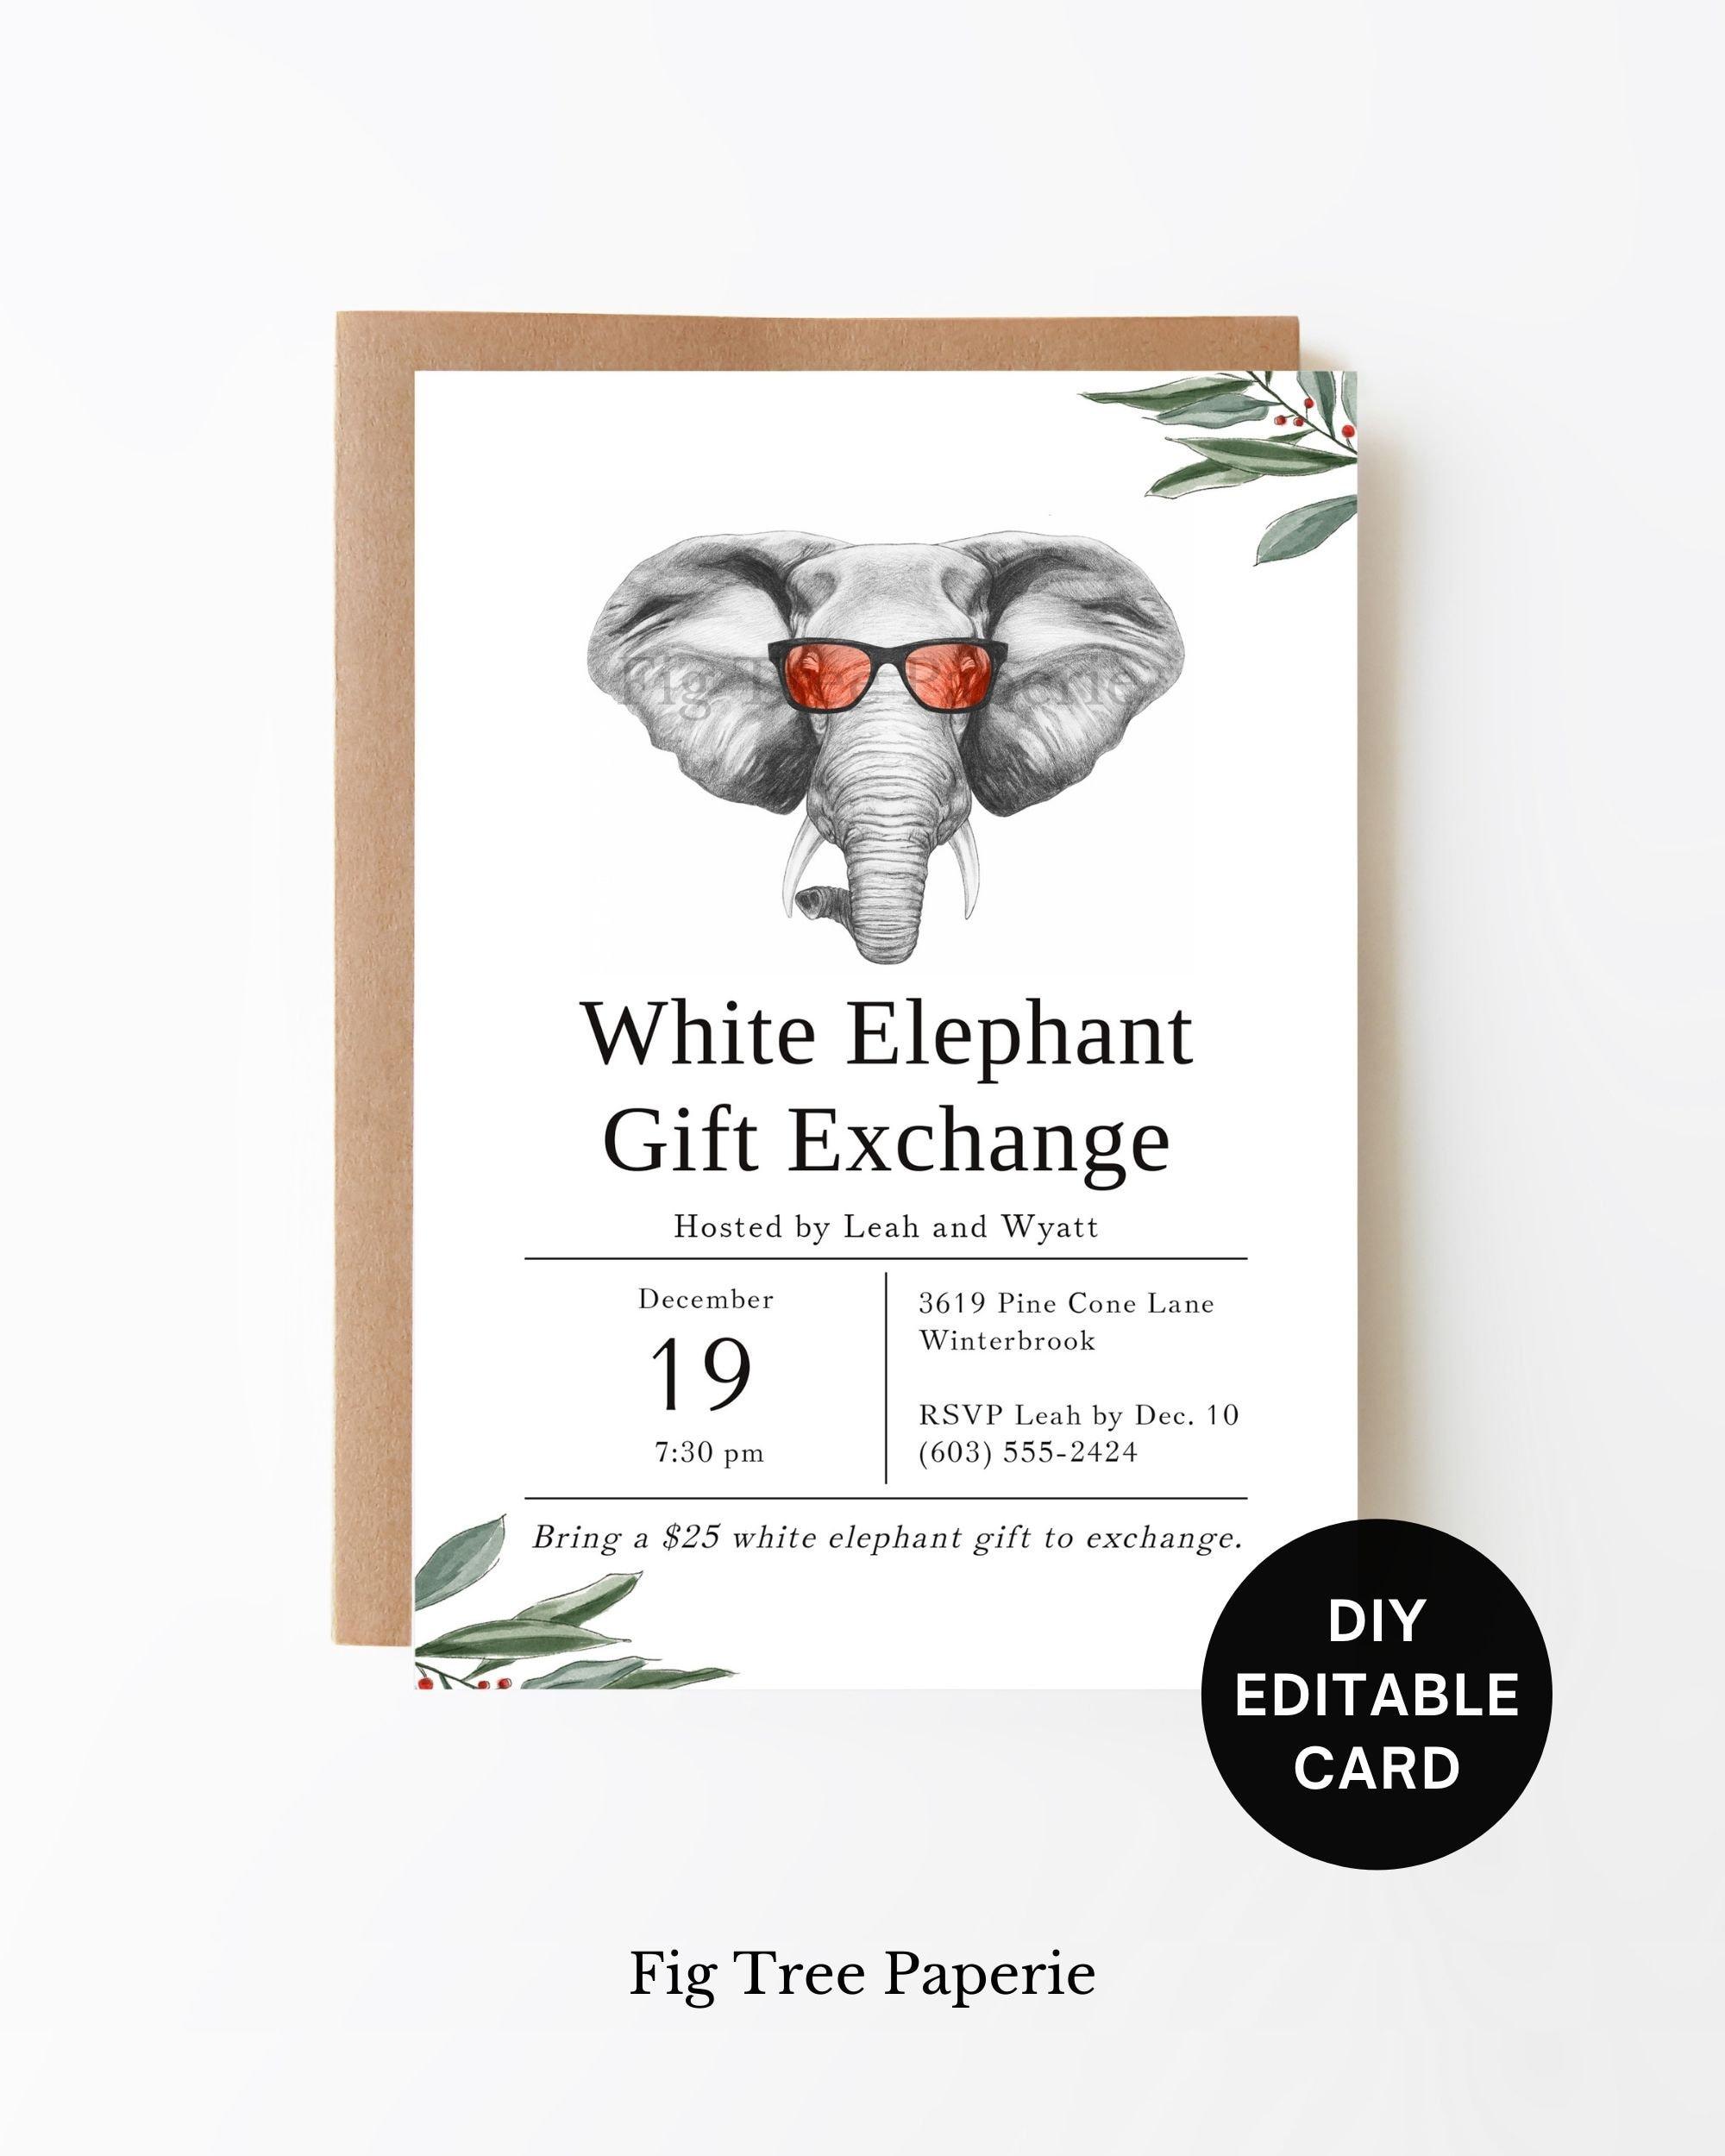 White Elephant Party Invitation, White Elephant Office Holiday Party  Invite, Christmas Gift Exchange Party, White Elephant Friendsmas Party